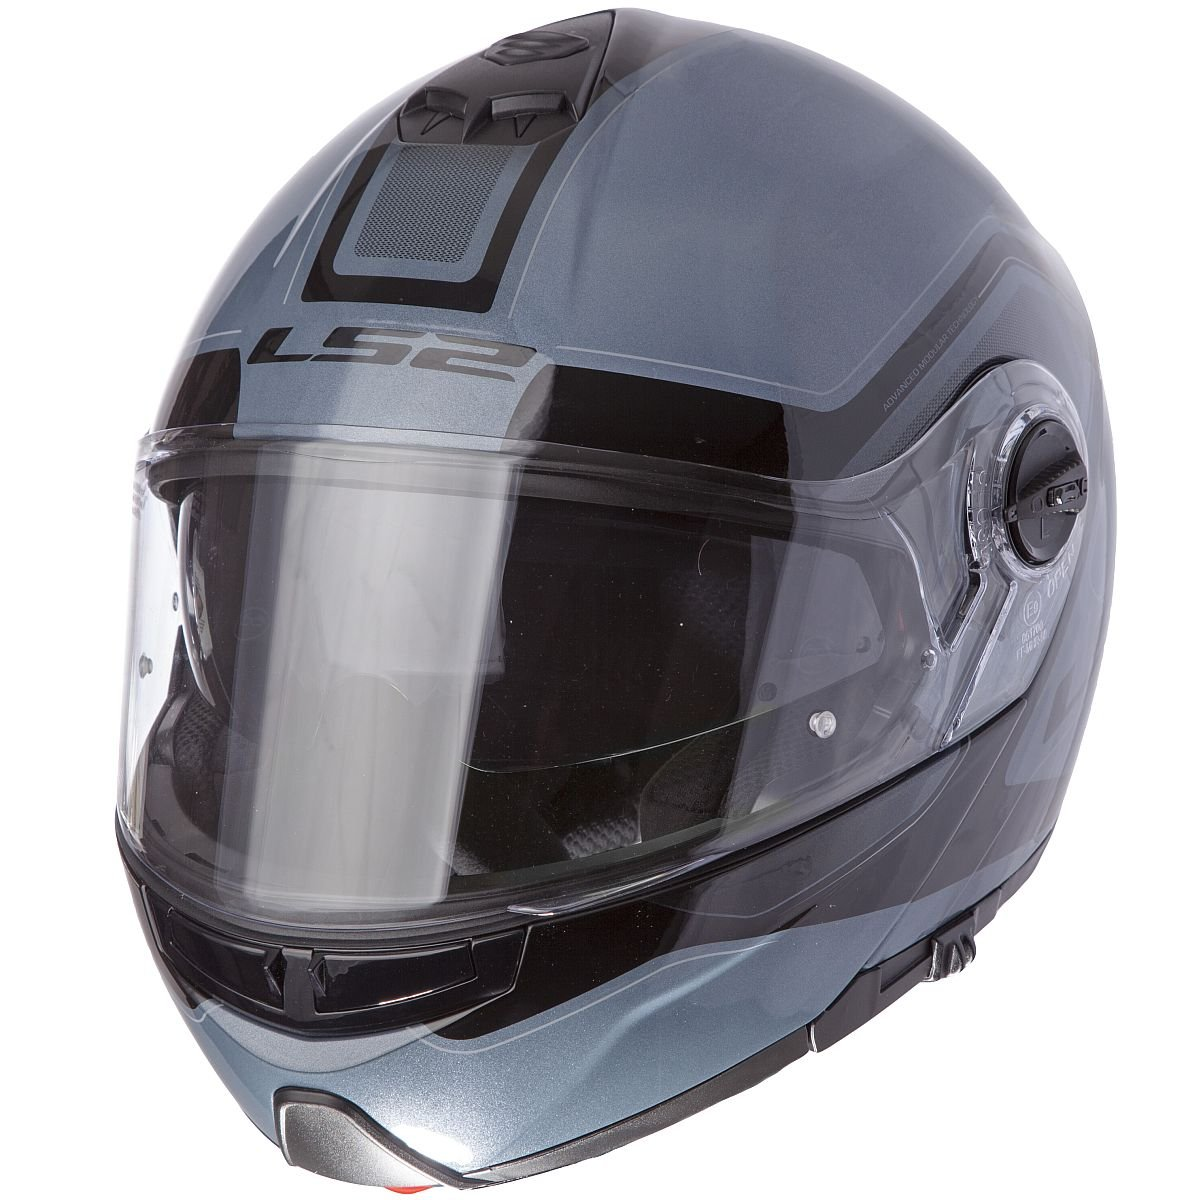 LS2 Helmets Strobe Civik Modular Motorcycle Helmet with Sunshield (Dark Blue, Medium)